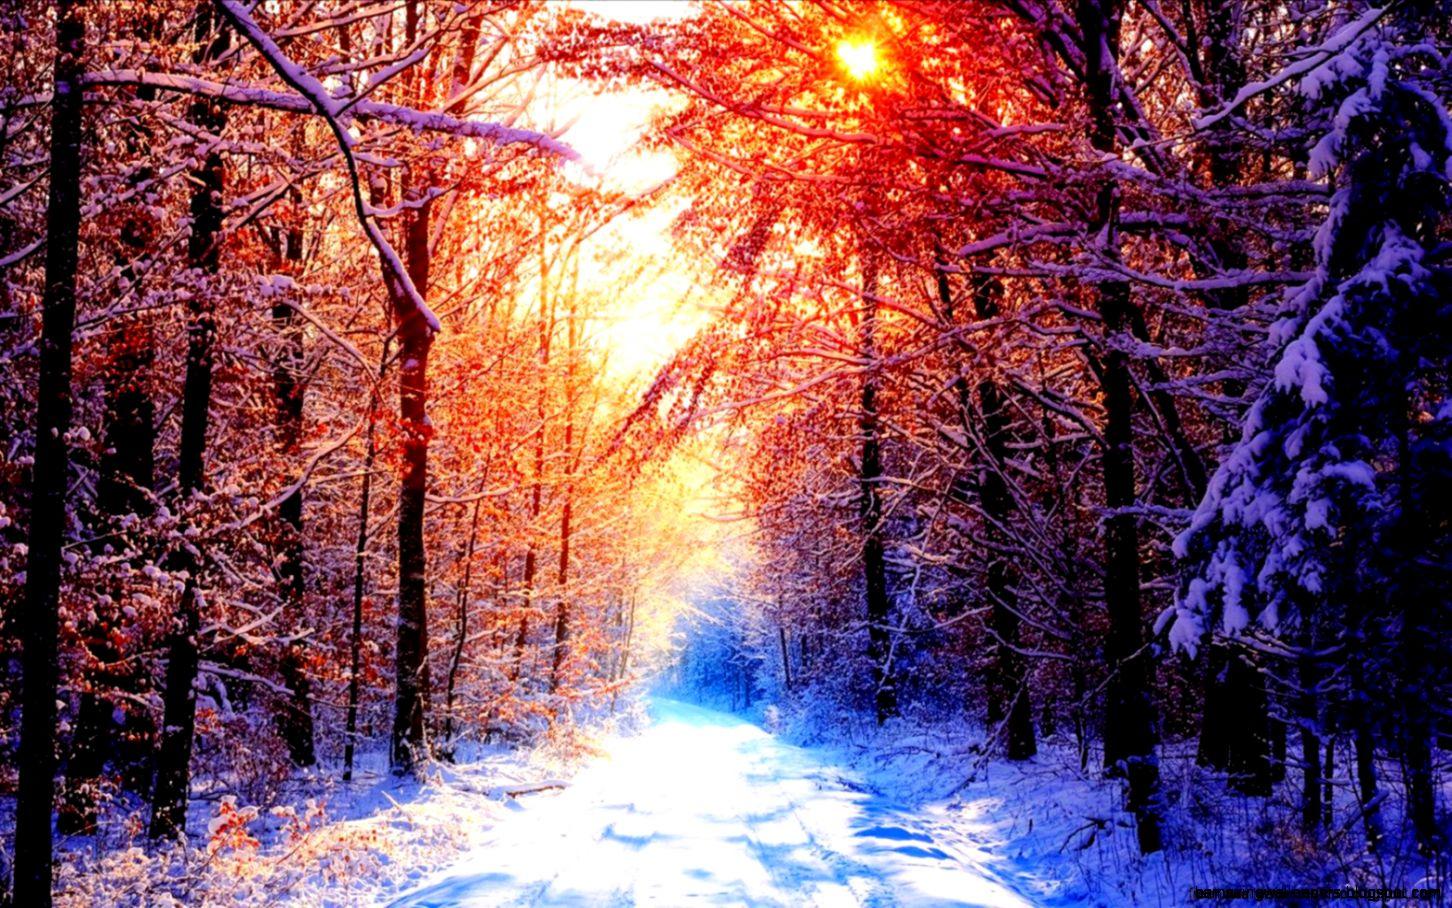 Snow Sunrise Wallpaper Desktop  Free High Definition Wallpapers